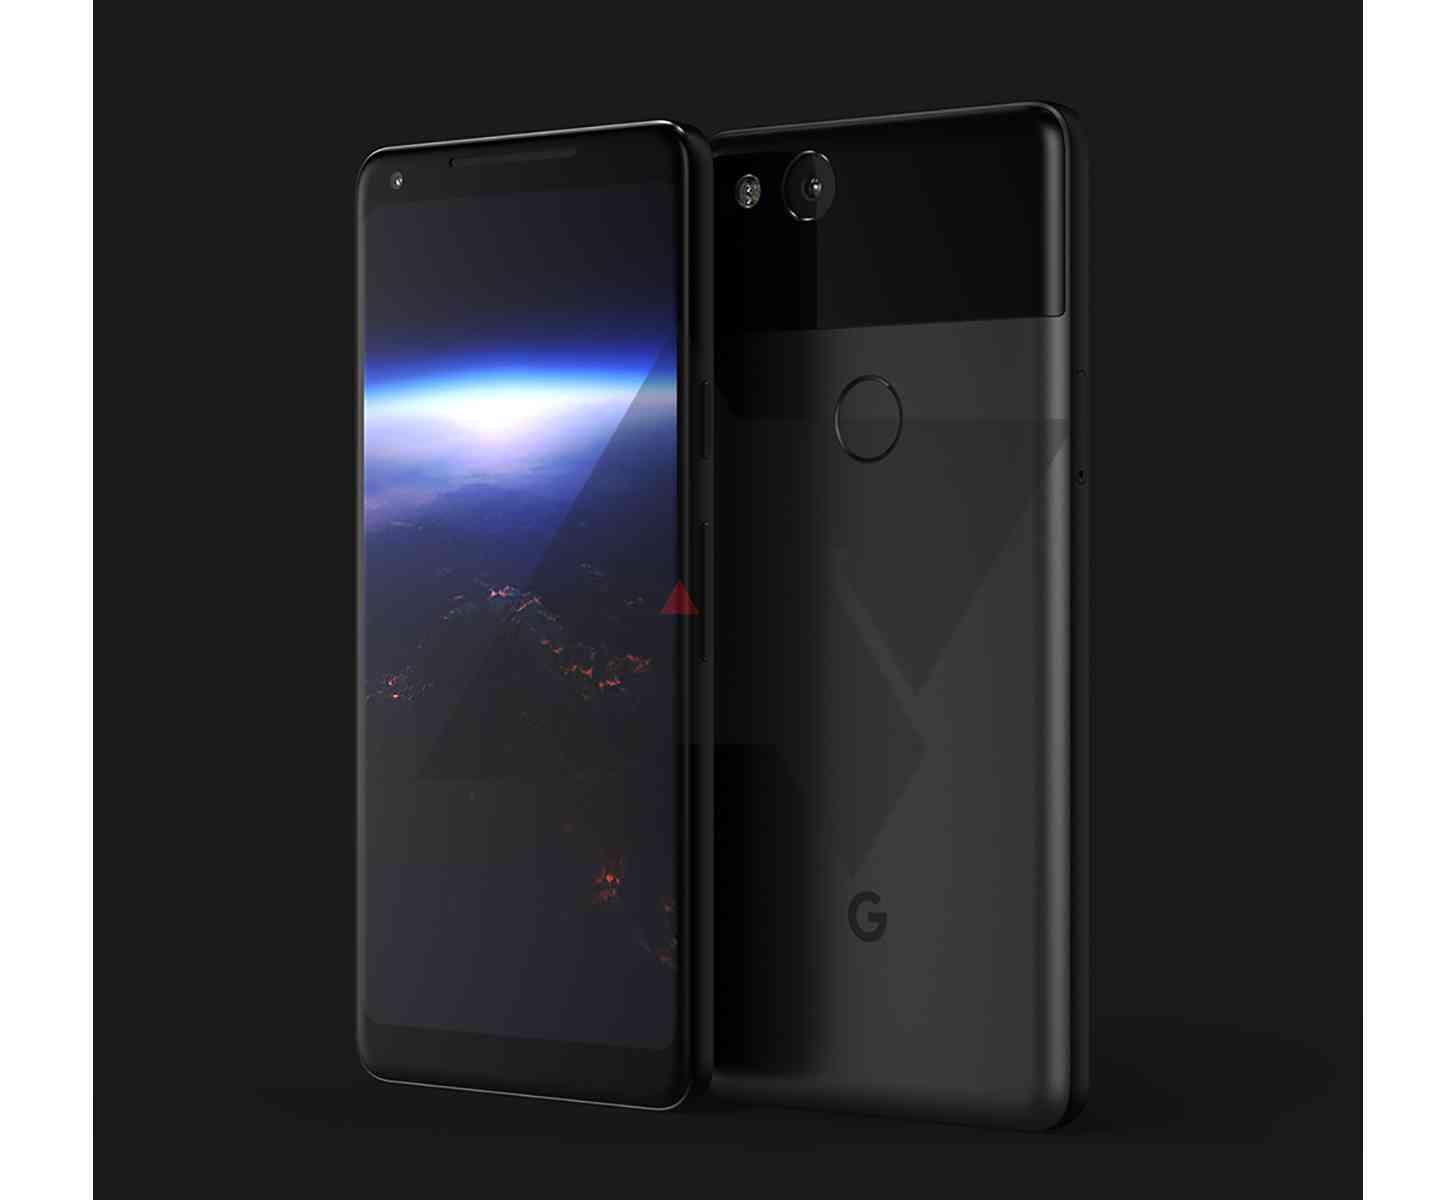 9337c7c5c25609 Google Pixel XL 2017 reportedly shown off in render leak | PhoneDog